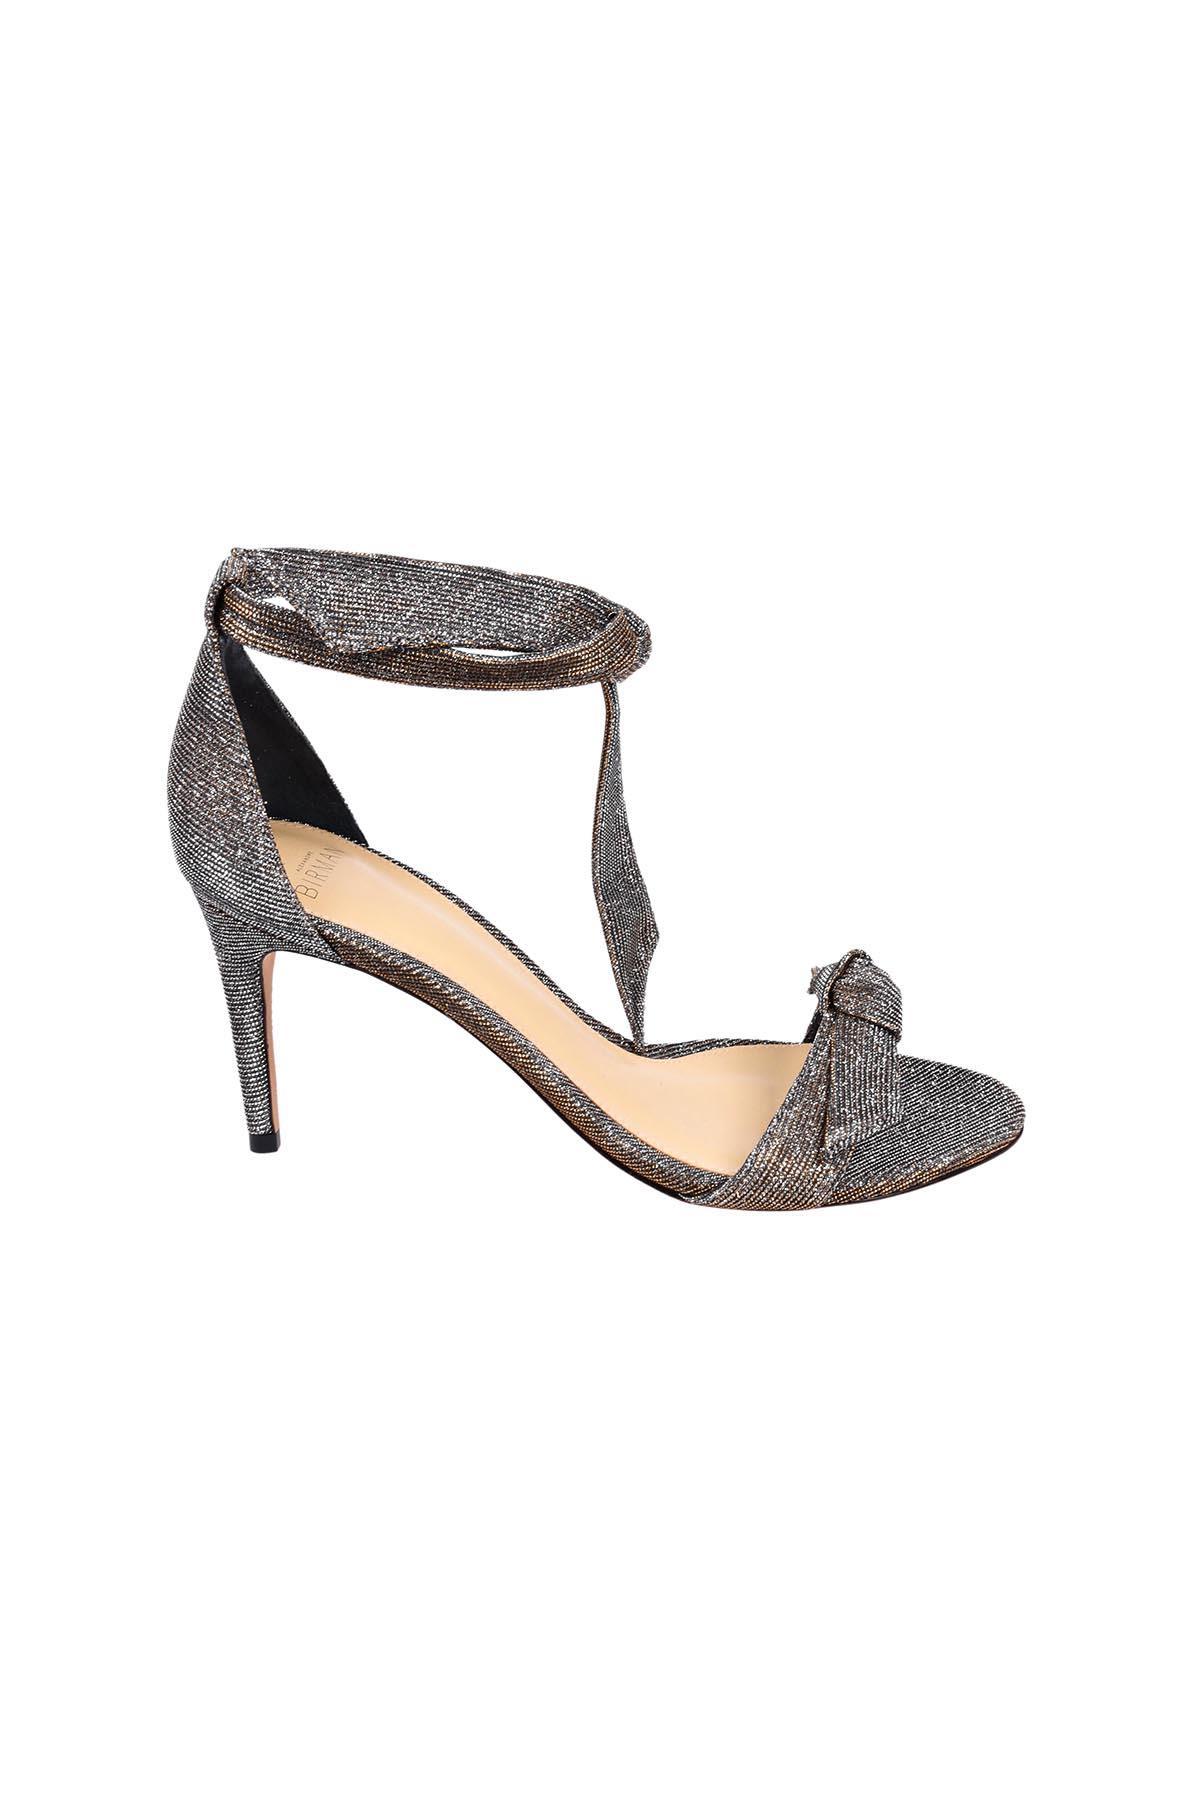 5ee6c3be796 Alexandre Birman Clarita Mid-Heel Metallic Evening Fabric Sandals In Stellar